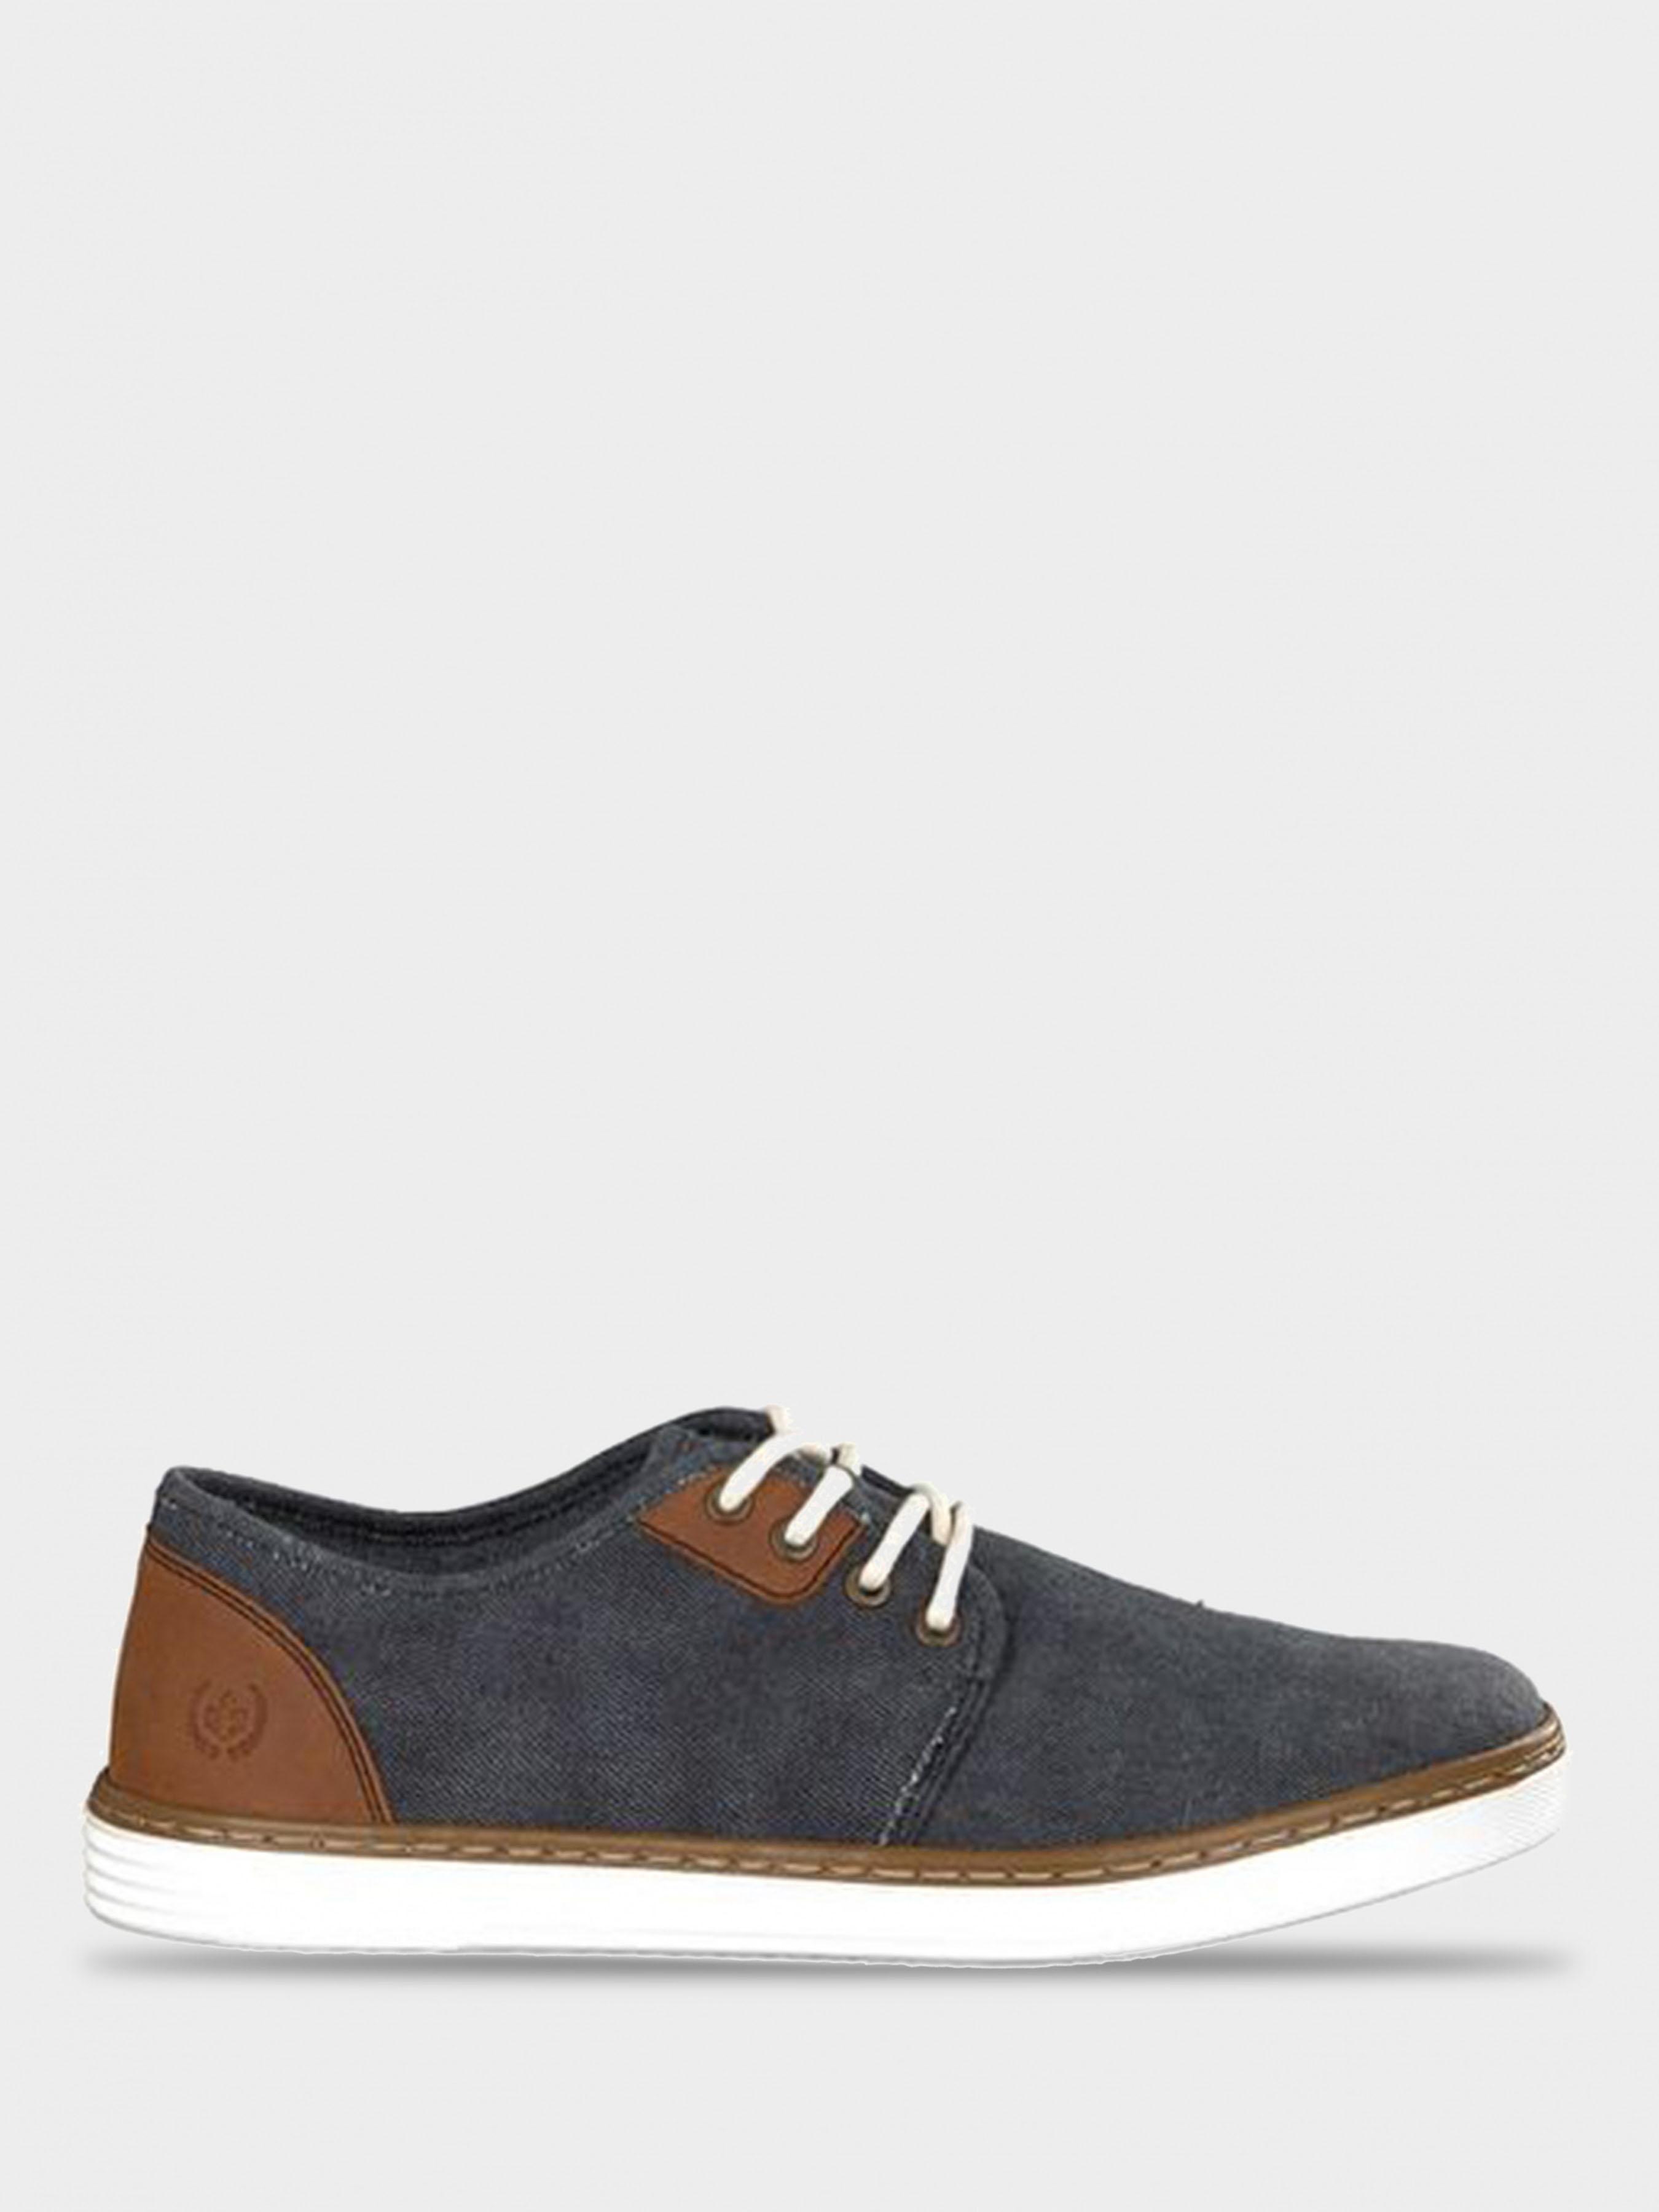 Полуботинки для мужчин RIEKER RK652 размеры обуви, 2017